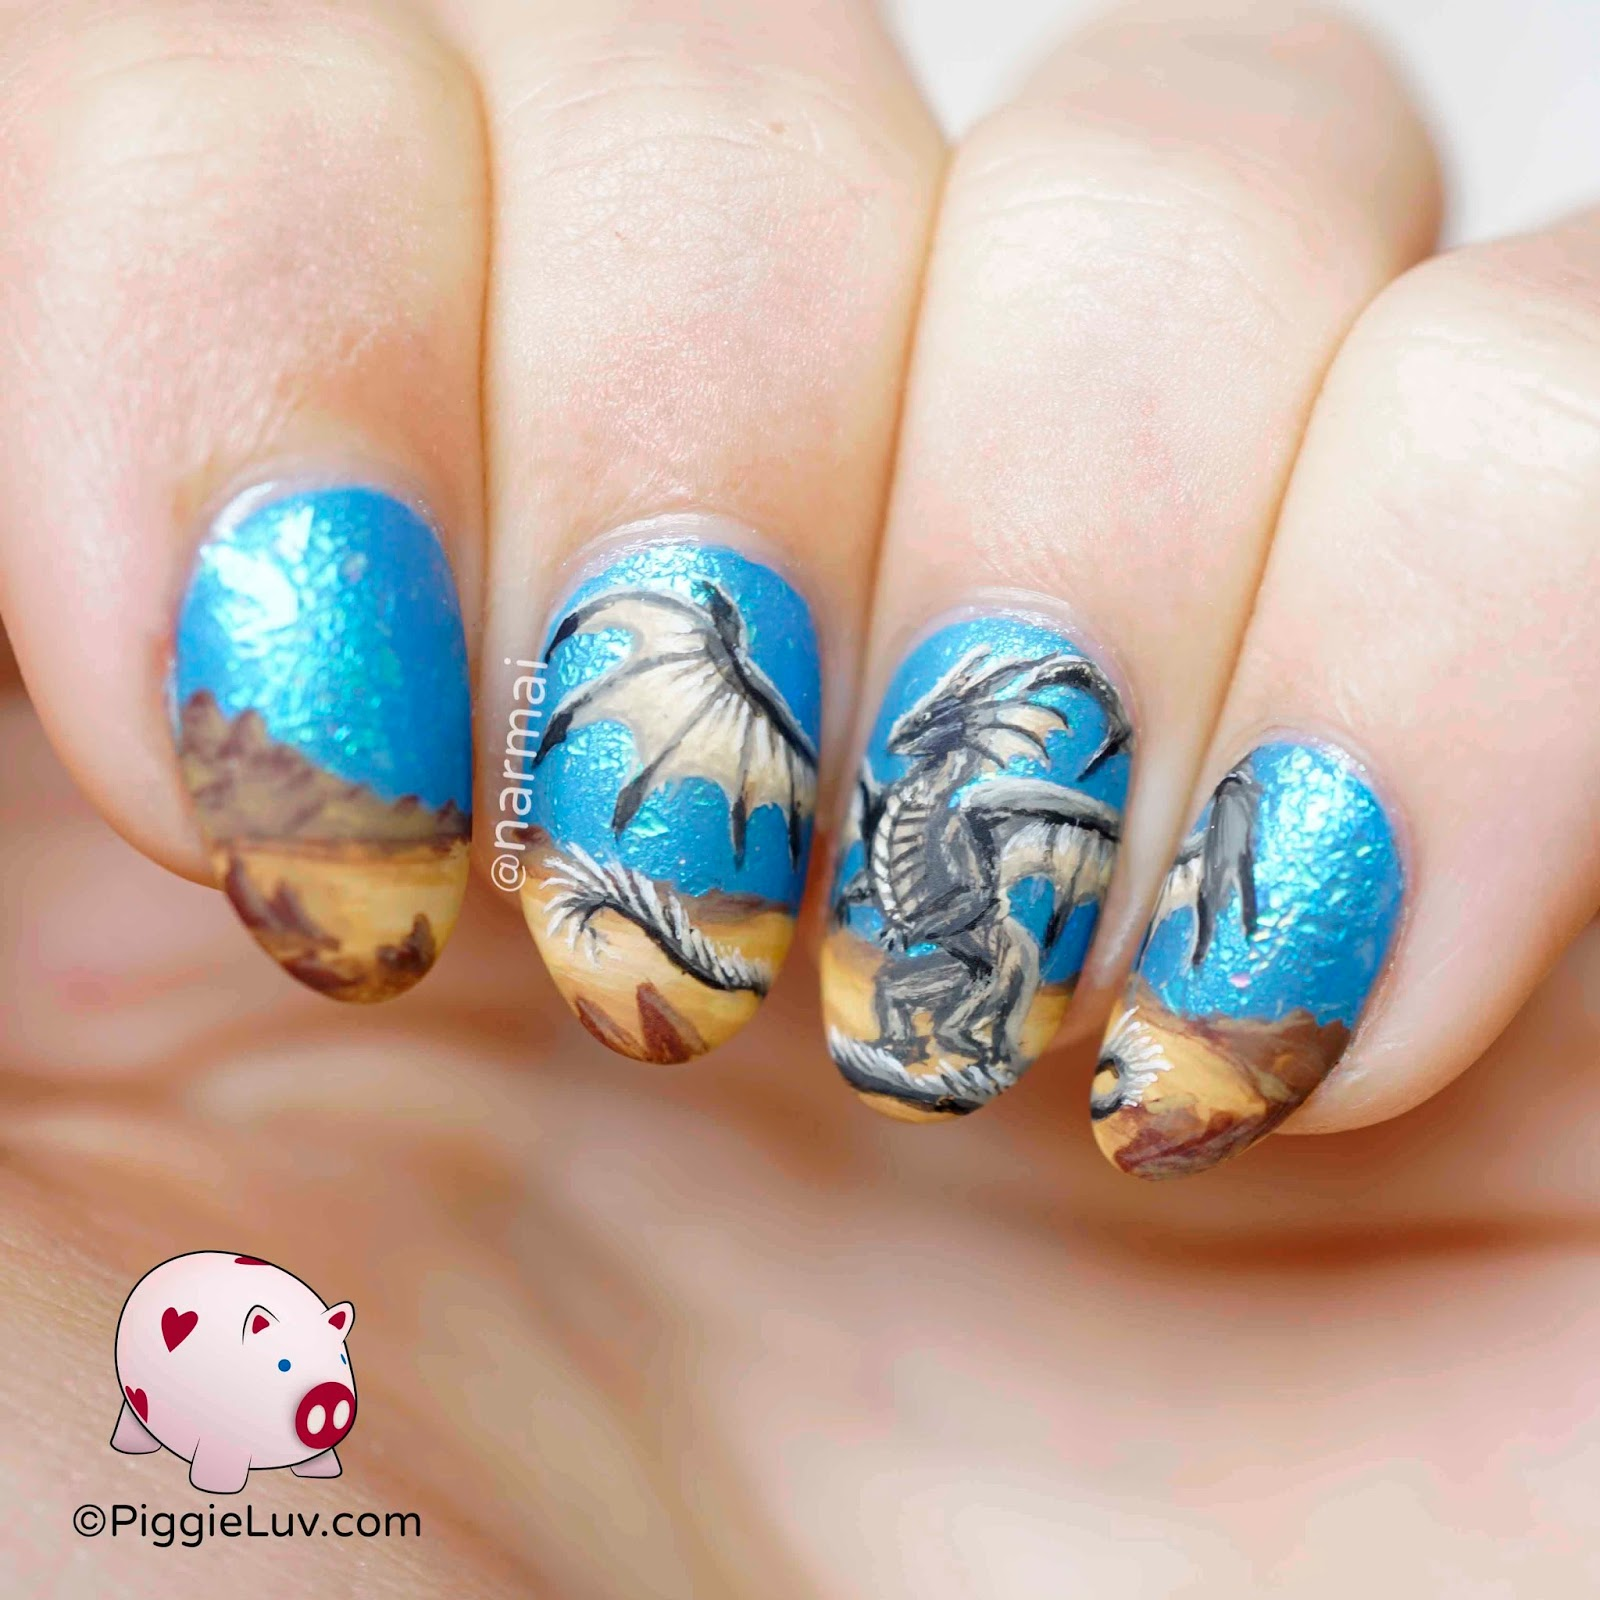 Piggieluv Desert Dragon Nail Art